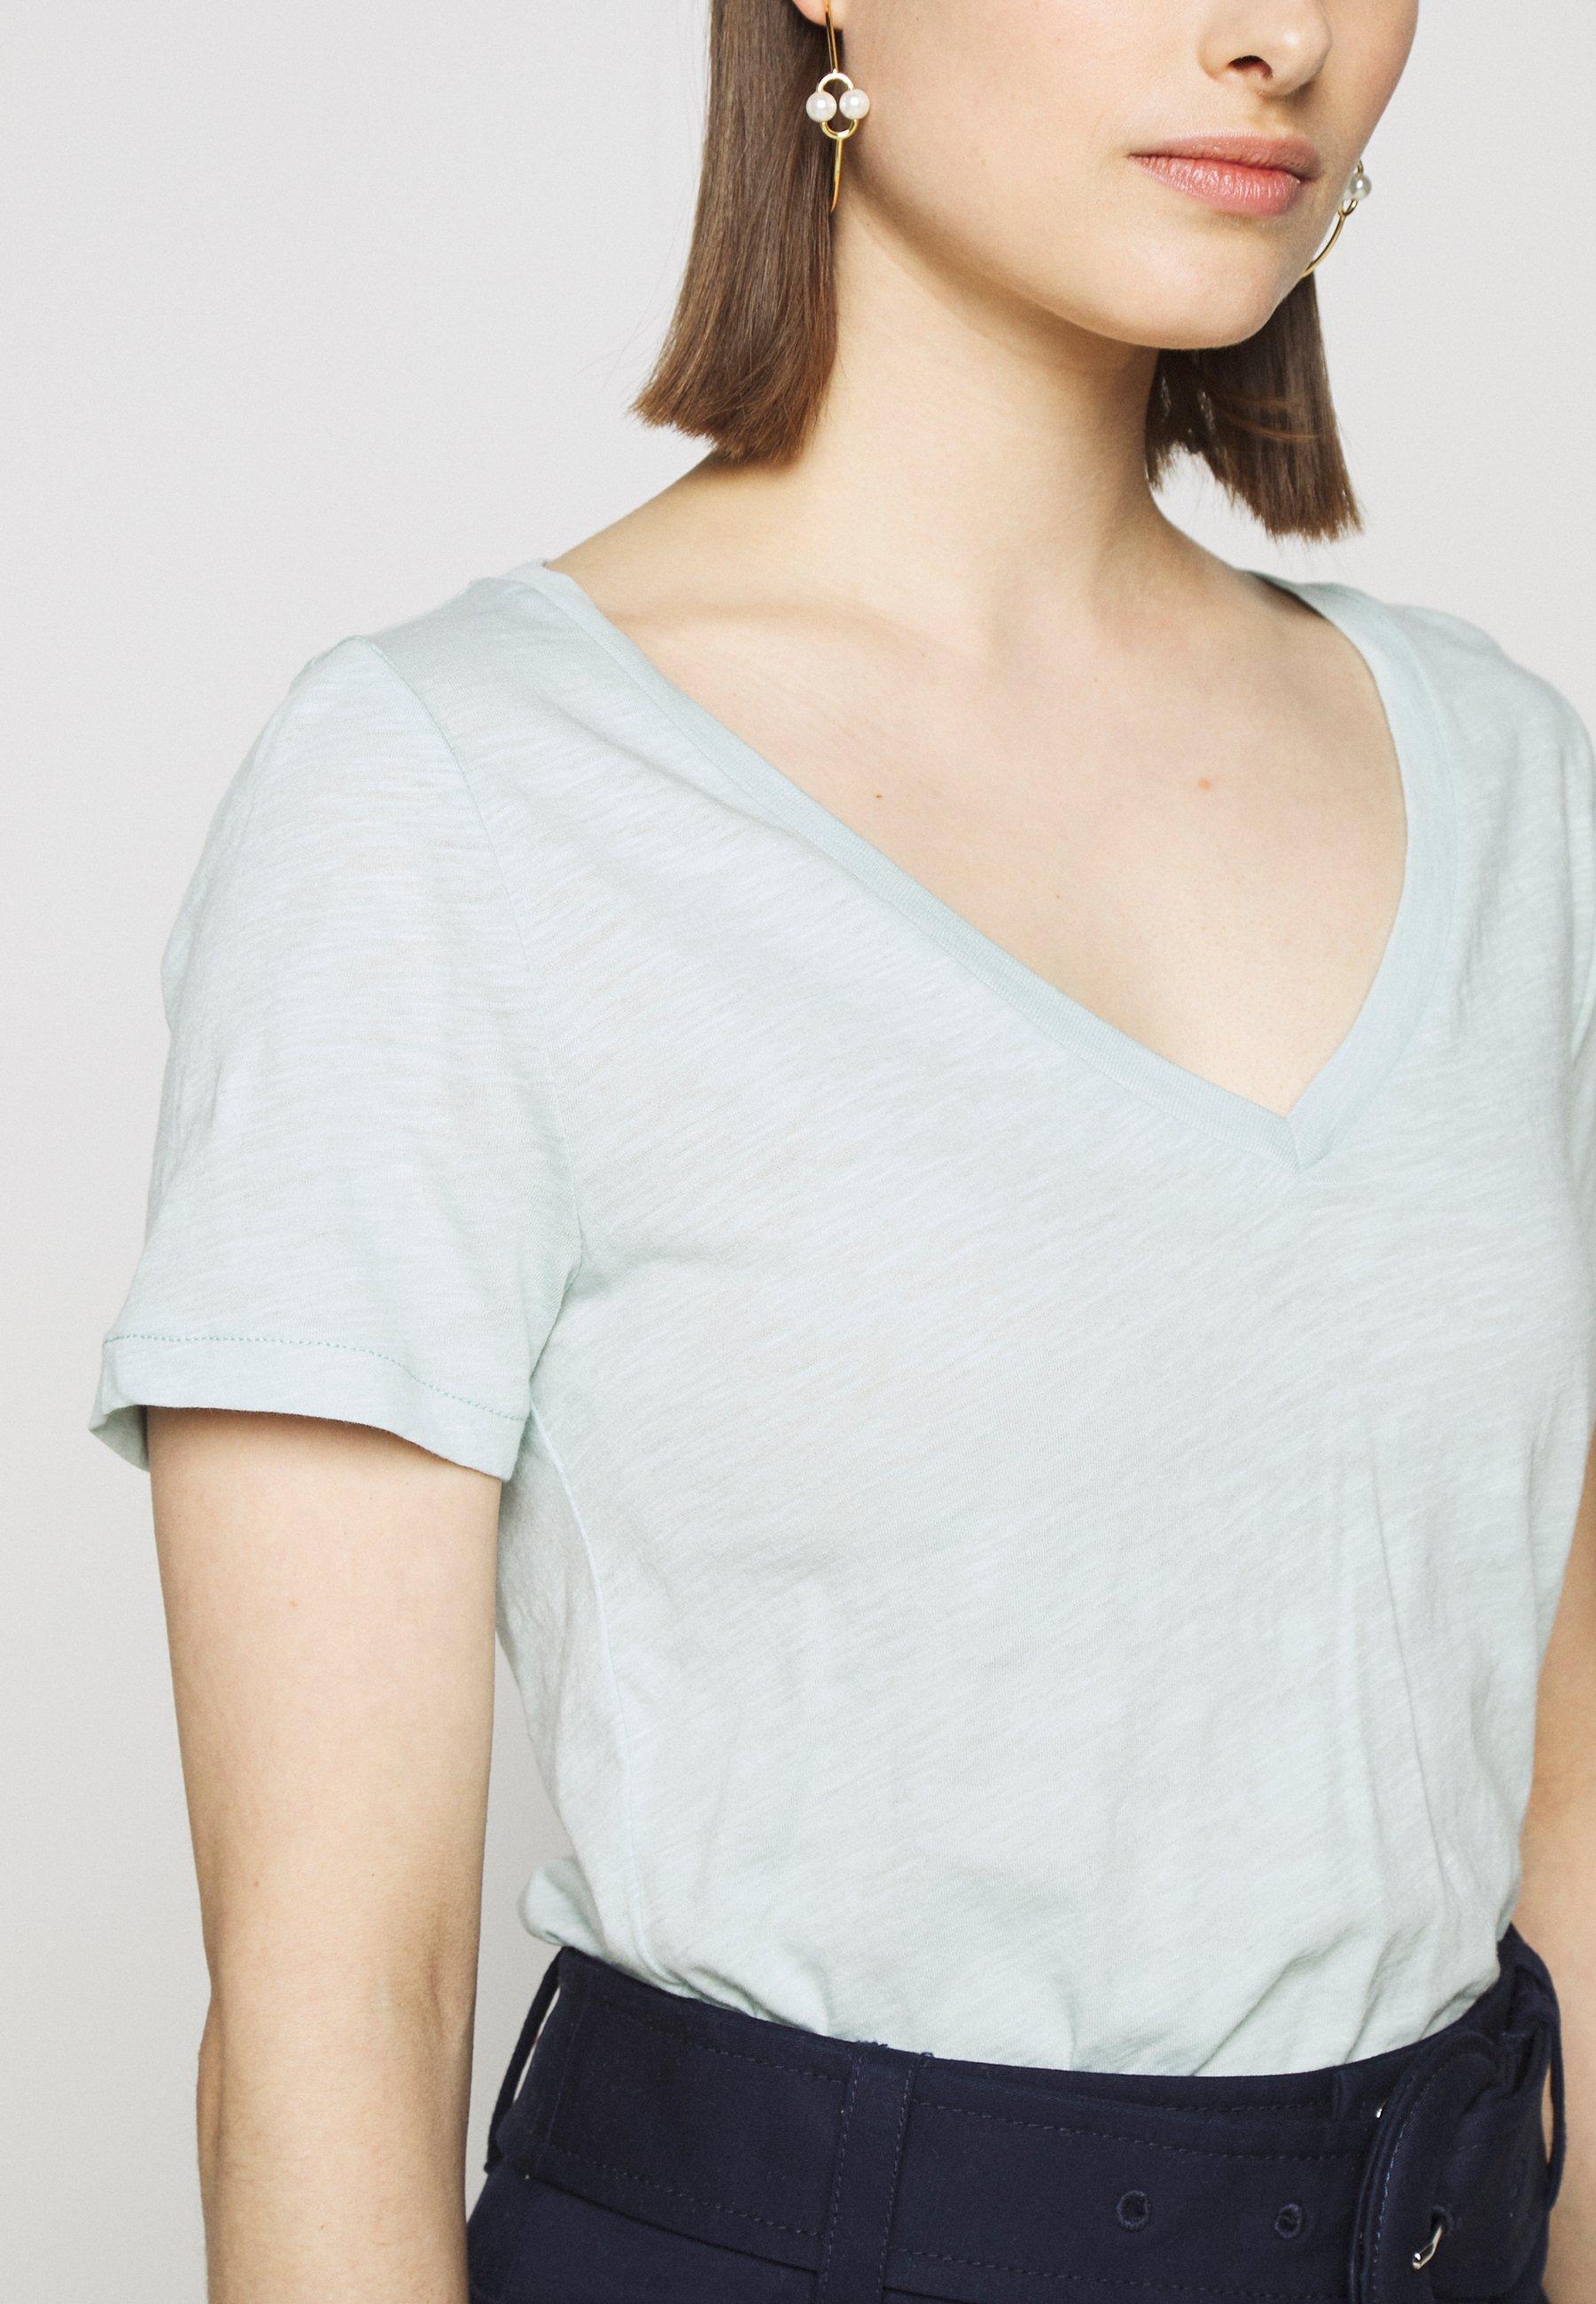 J.crew Vintage V Neck Tee - T-shirts Faded Mint/blågrå